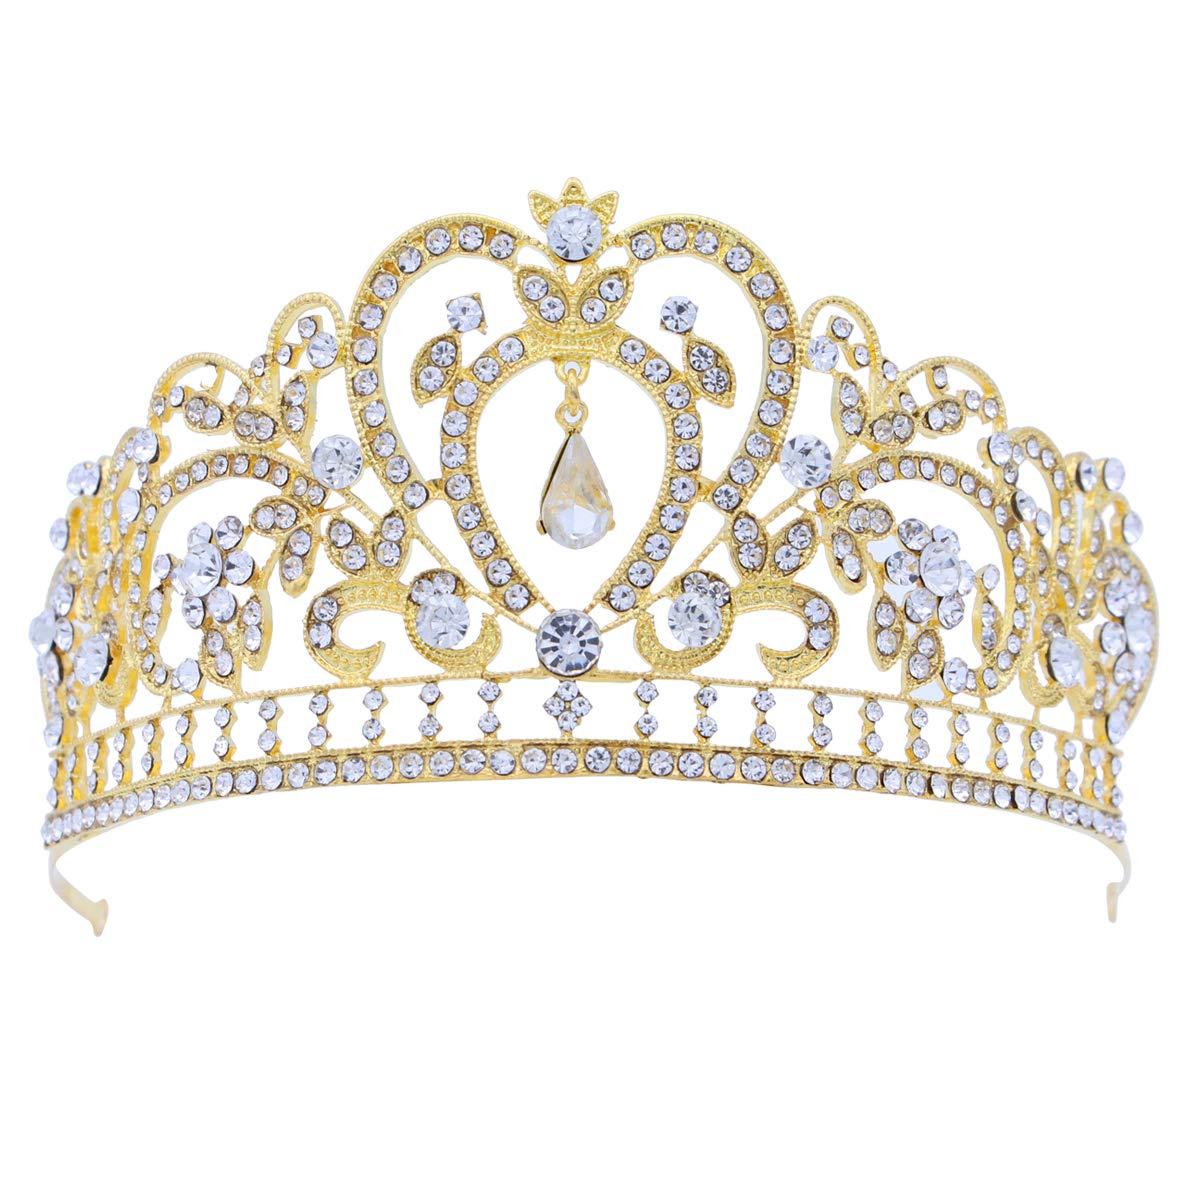 TINKSKY Wedding Rhinestone Decorated Crown/Hair Barrettes/Hairband/Hair Clip/Hair Loop (Silver)